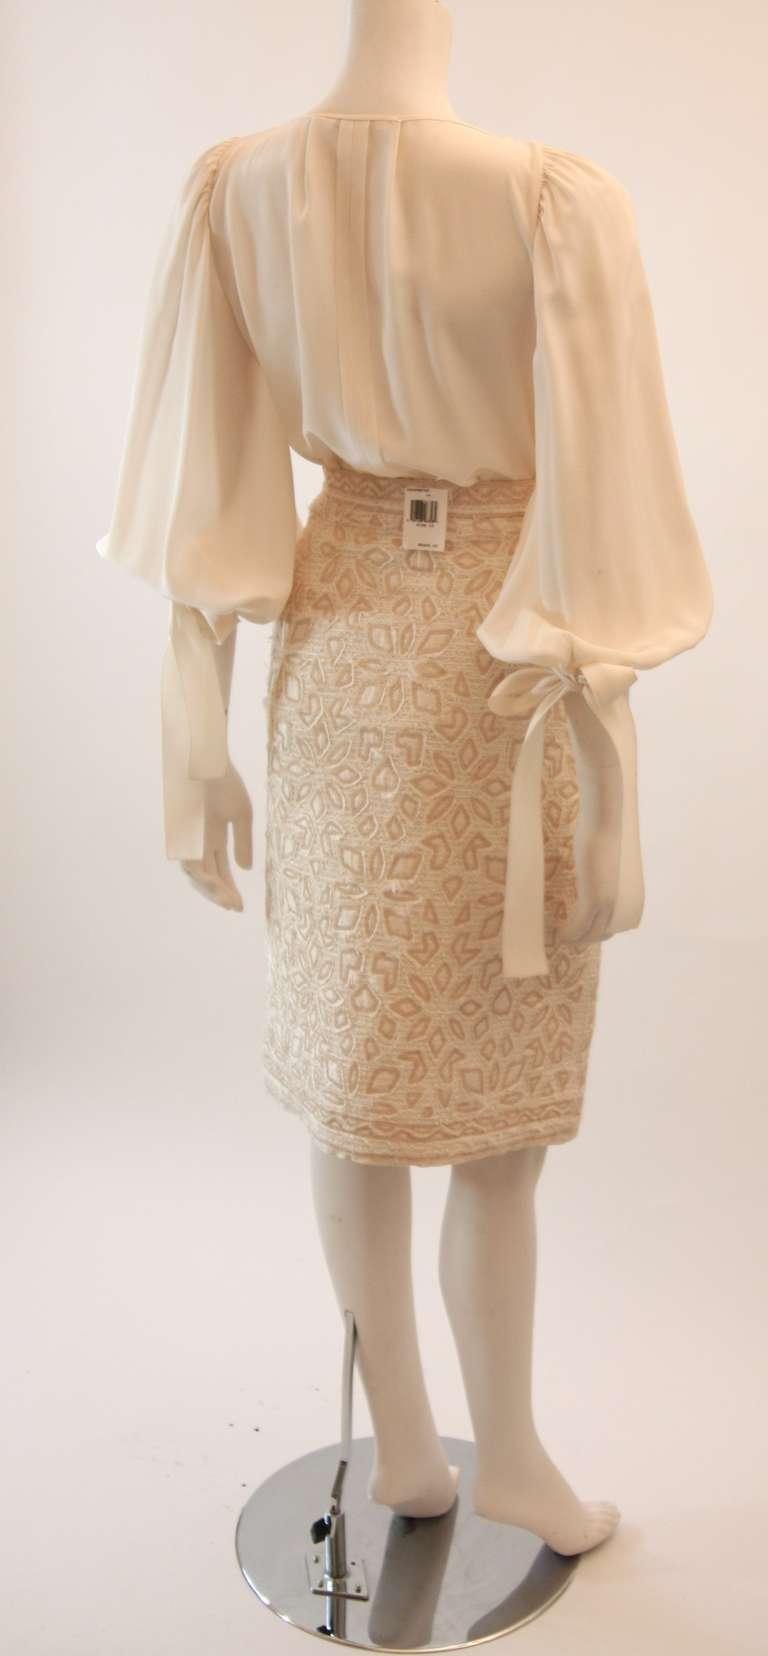 Oscar De La Renta Ivory and Cream Silk Blouse and Skirt Set Size 10 3